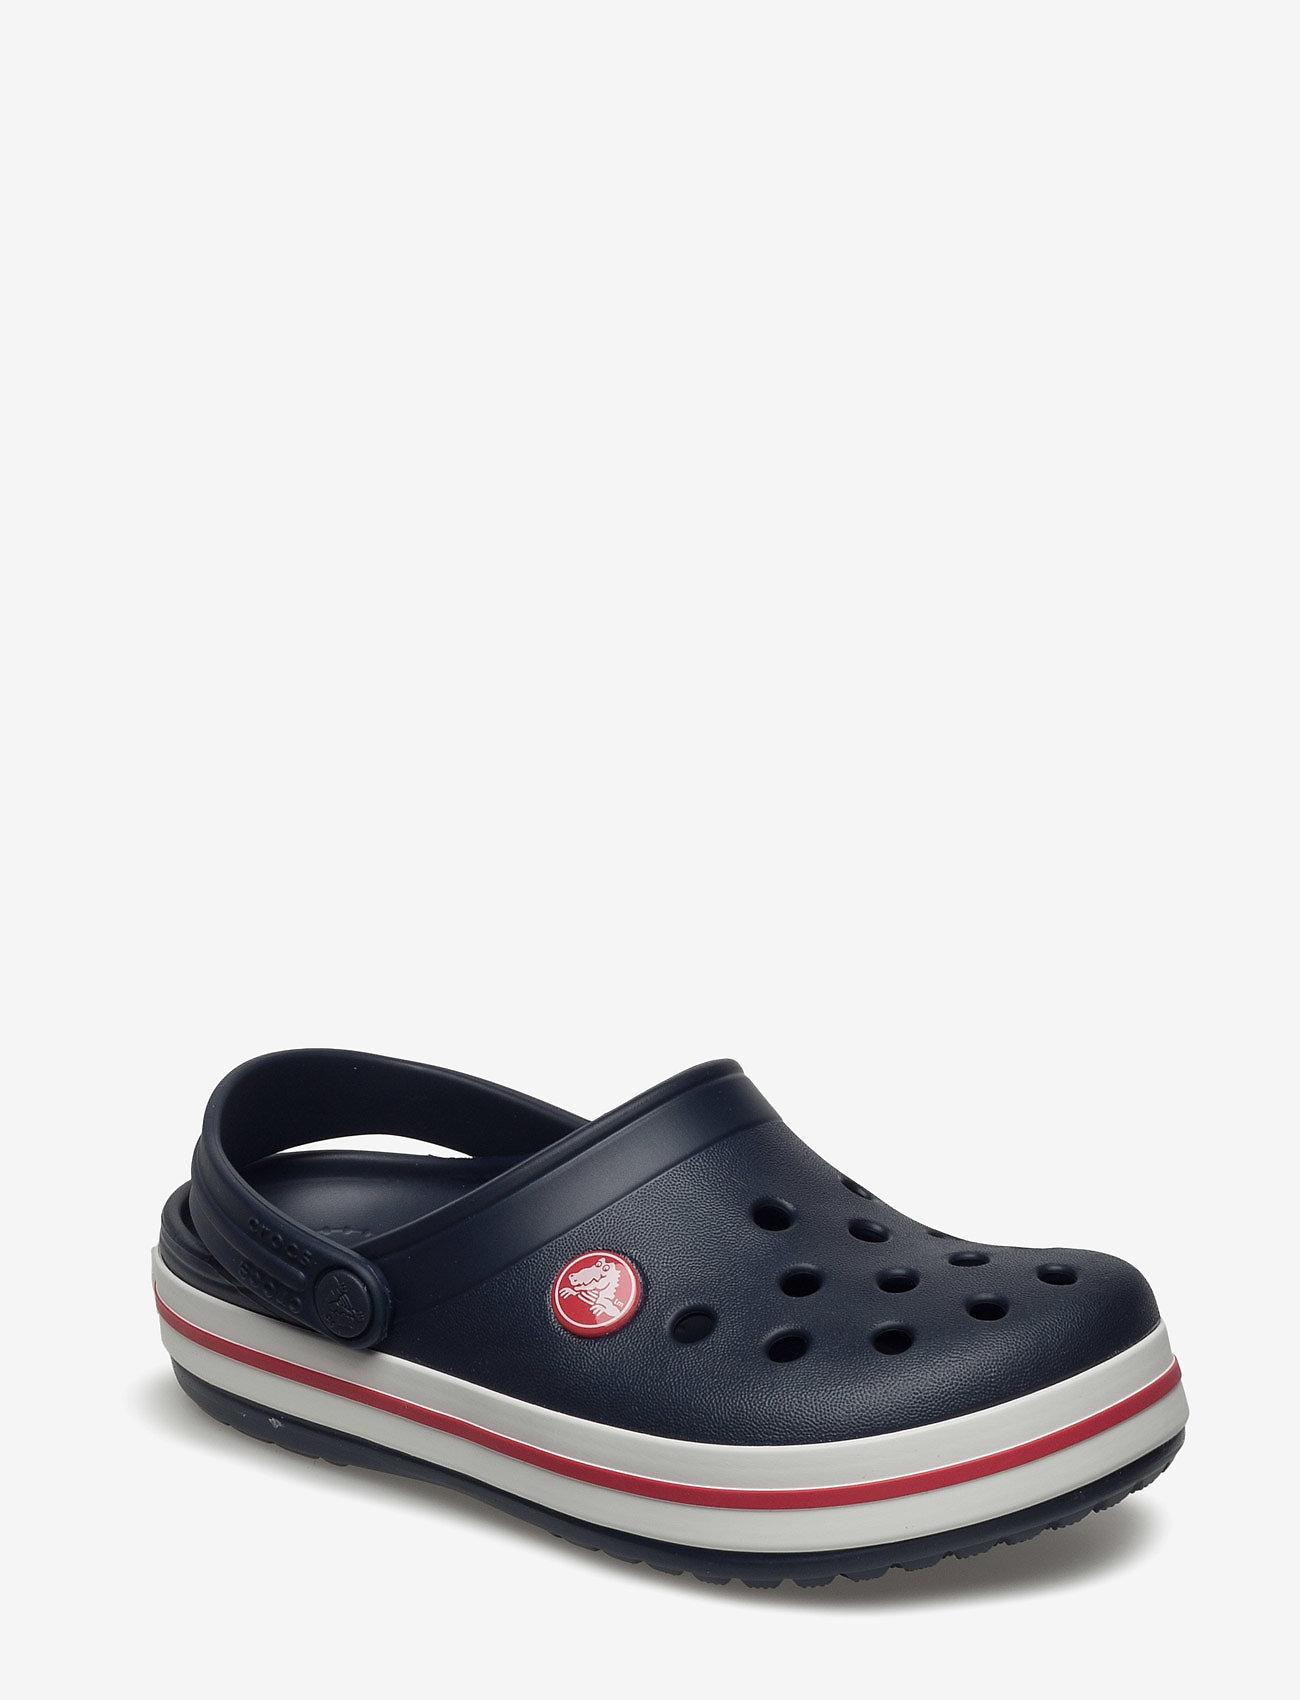 Crocs - Crocband Clog K - navy/red - 0